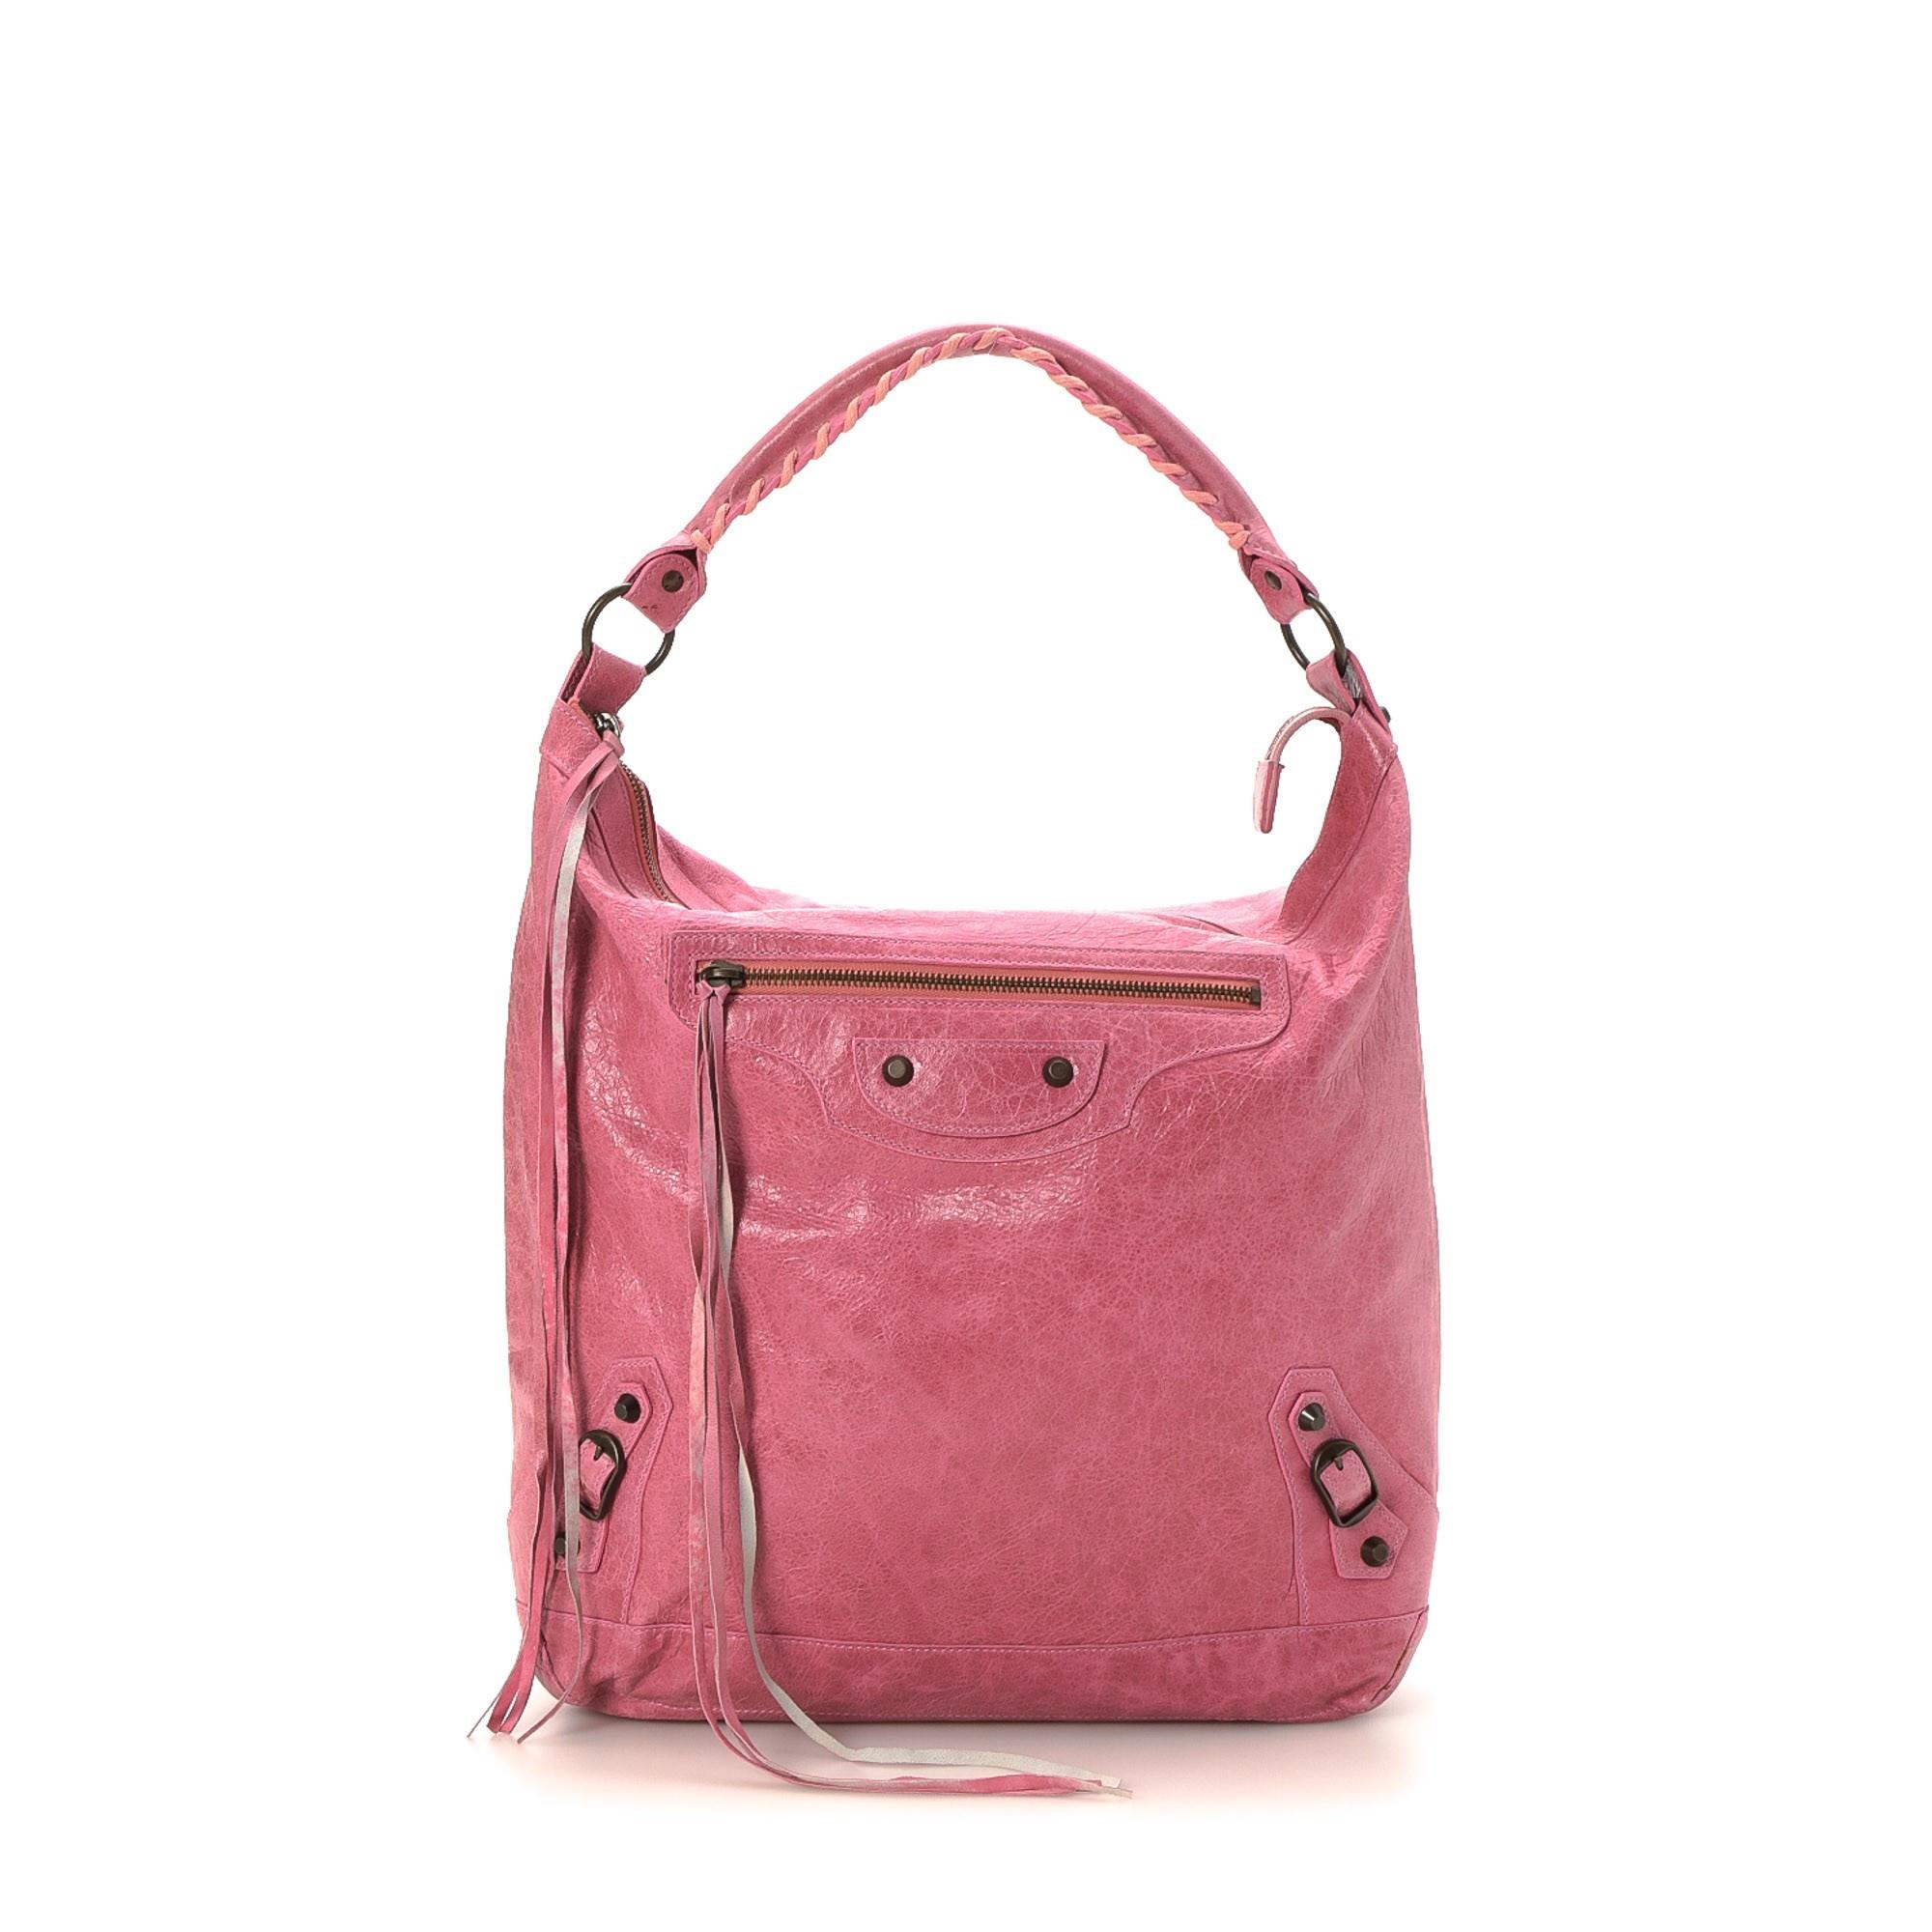 Balenciaga Day Pink Lambskin Shoulder Bag LXRCO